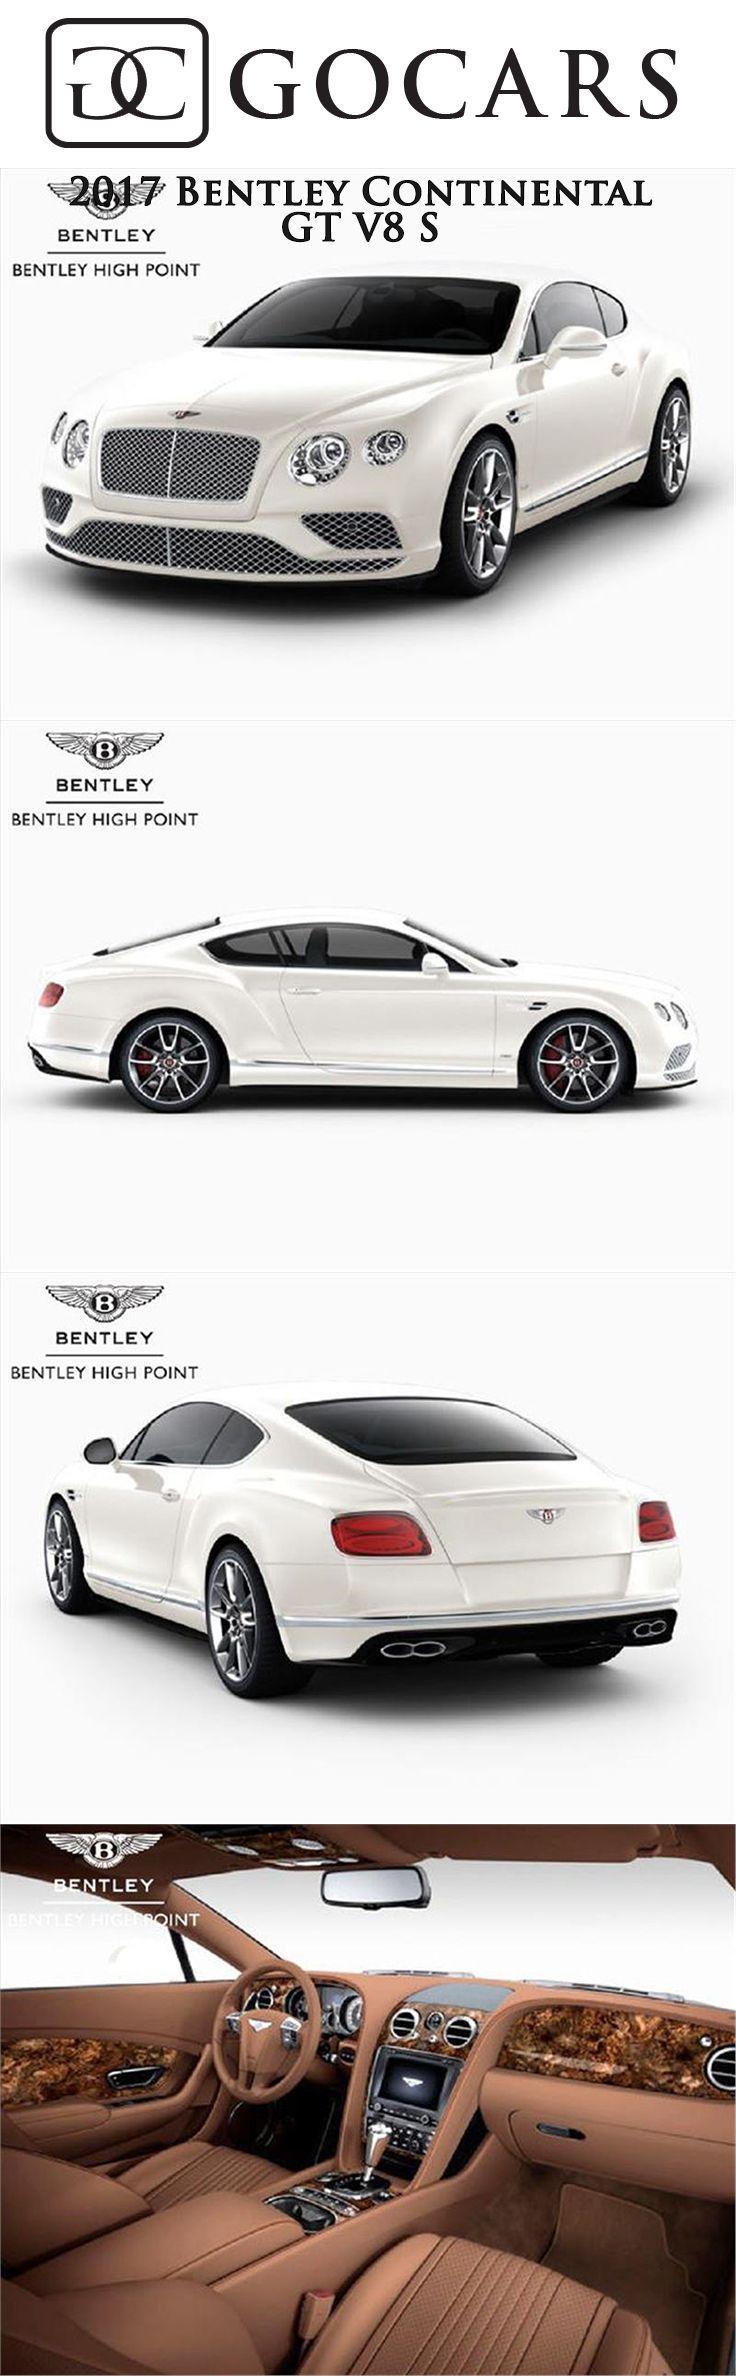 2017 Bentley Continental GT V8 S for sale in High Point, North Carolina #bentley #bentleycontinental #bentleycontinentalgt #bentleycontinentalgtv8s #sportscar #sportscars #supercar #supercars #luxury #luxurycars #bentleyphotos #gocars